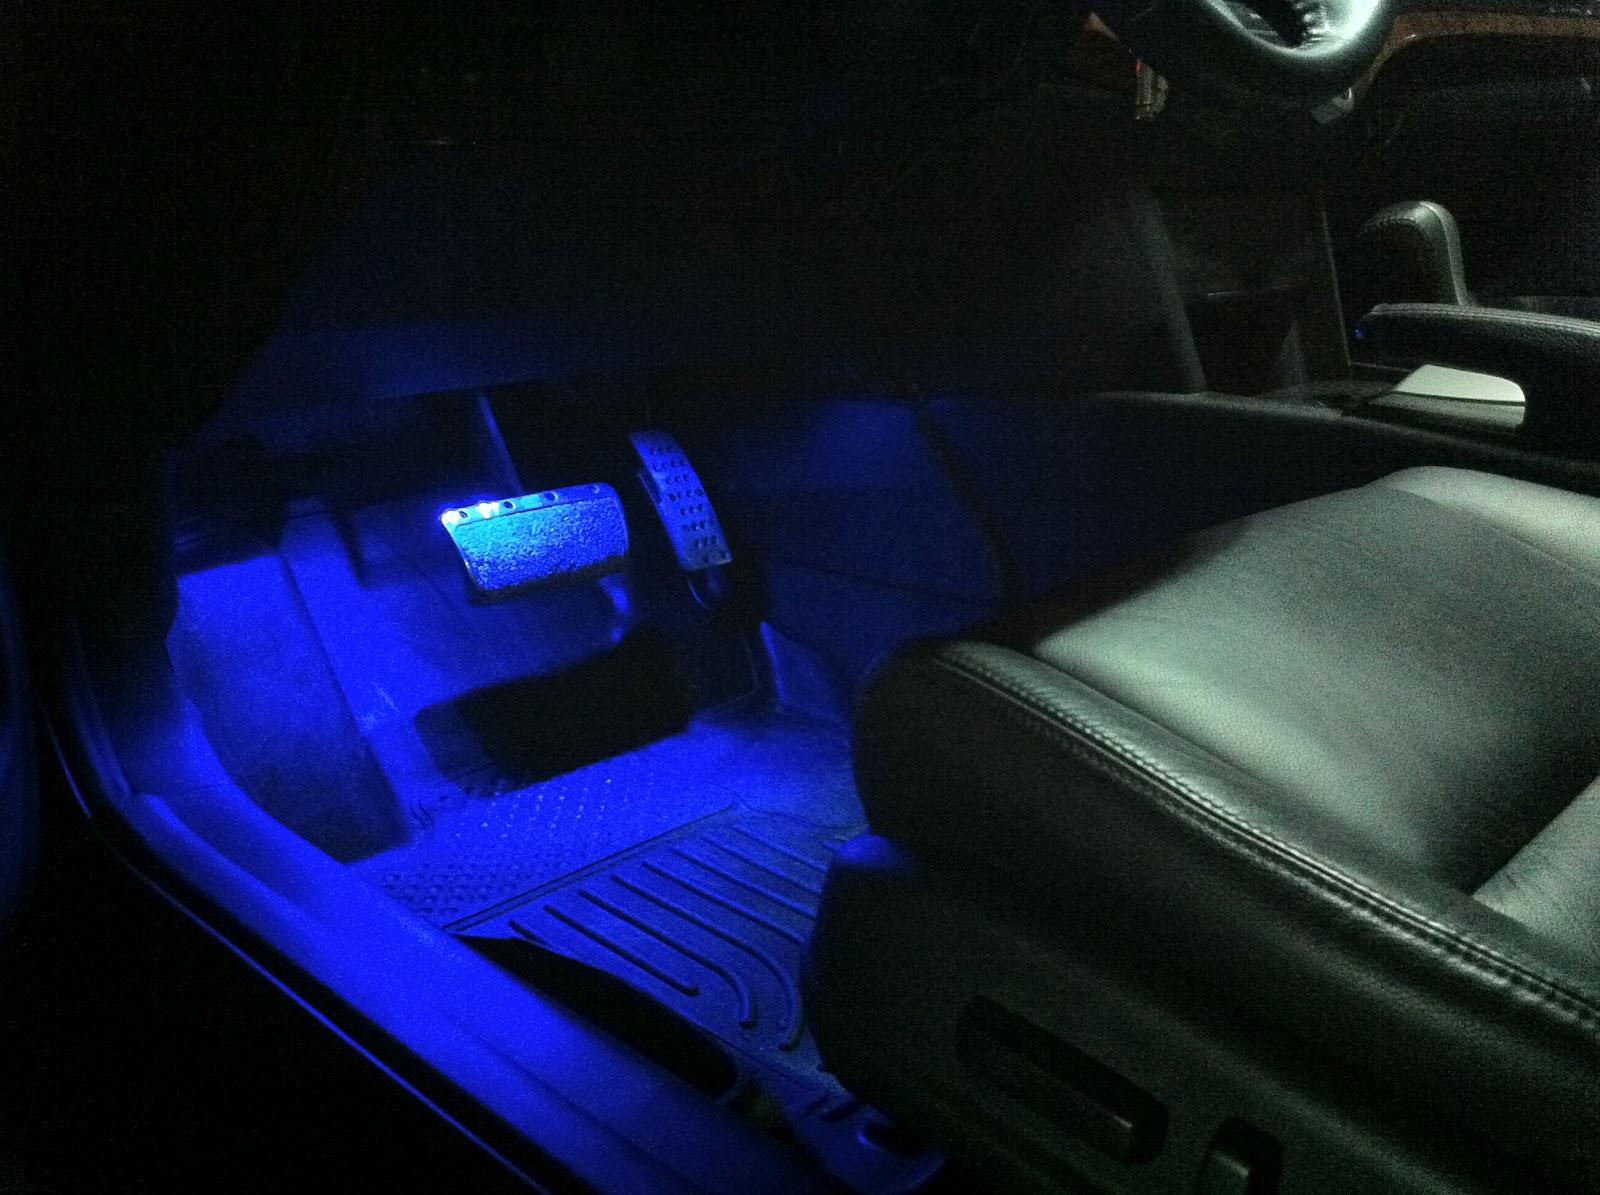 2011 Accord Inspire Build Blue Led Car Interior Lighting